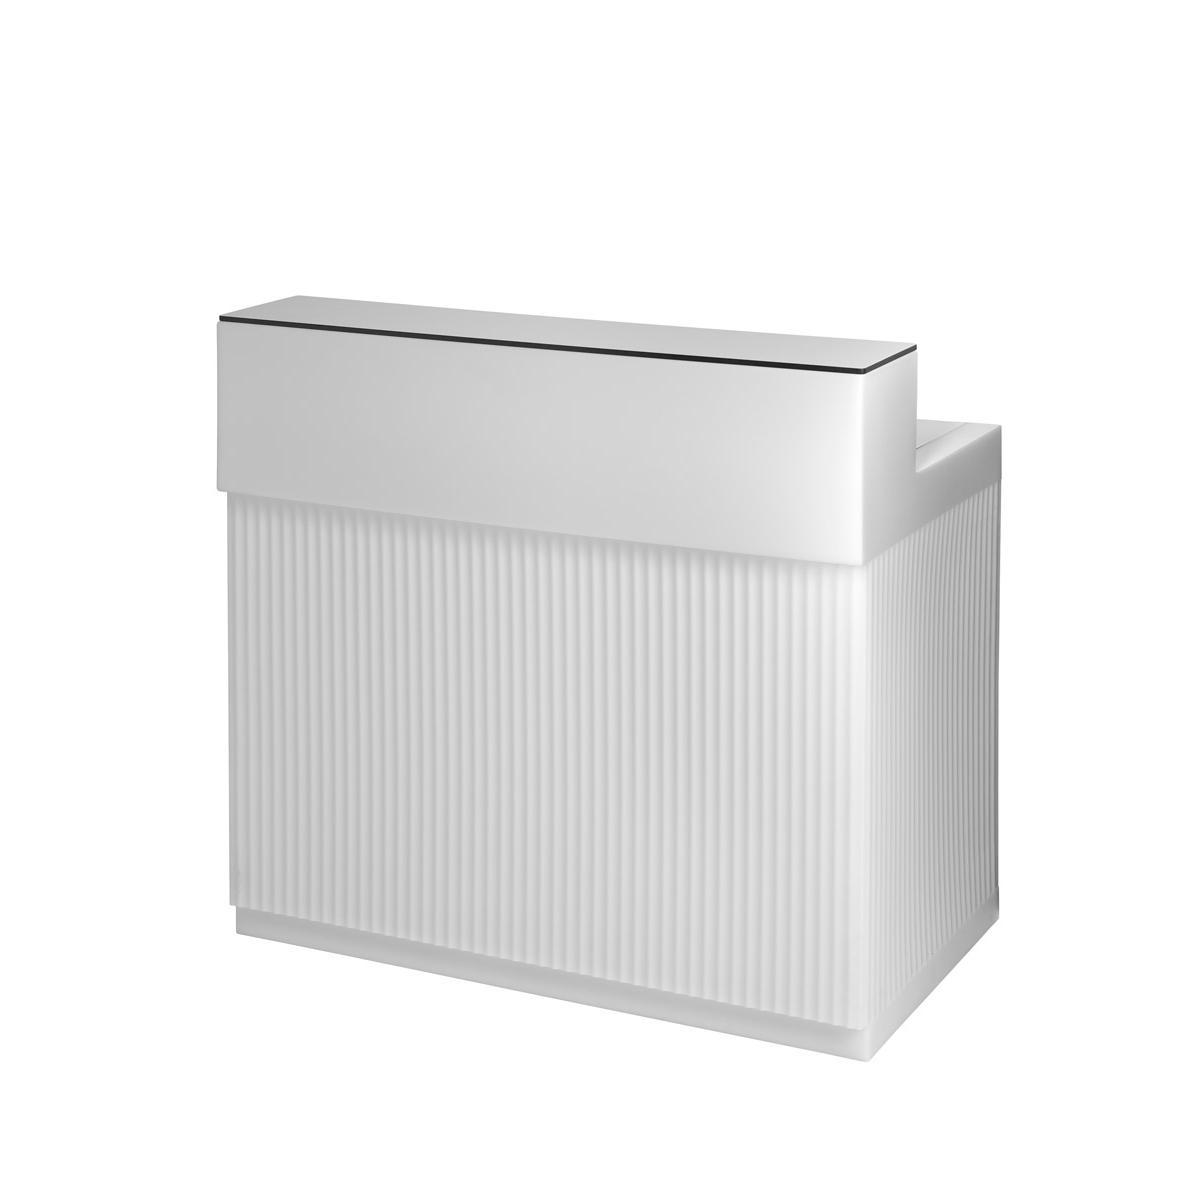 CORDIALE Bar beleuchtet, komplett weiß mit HPL-Platte weiss